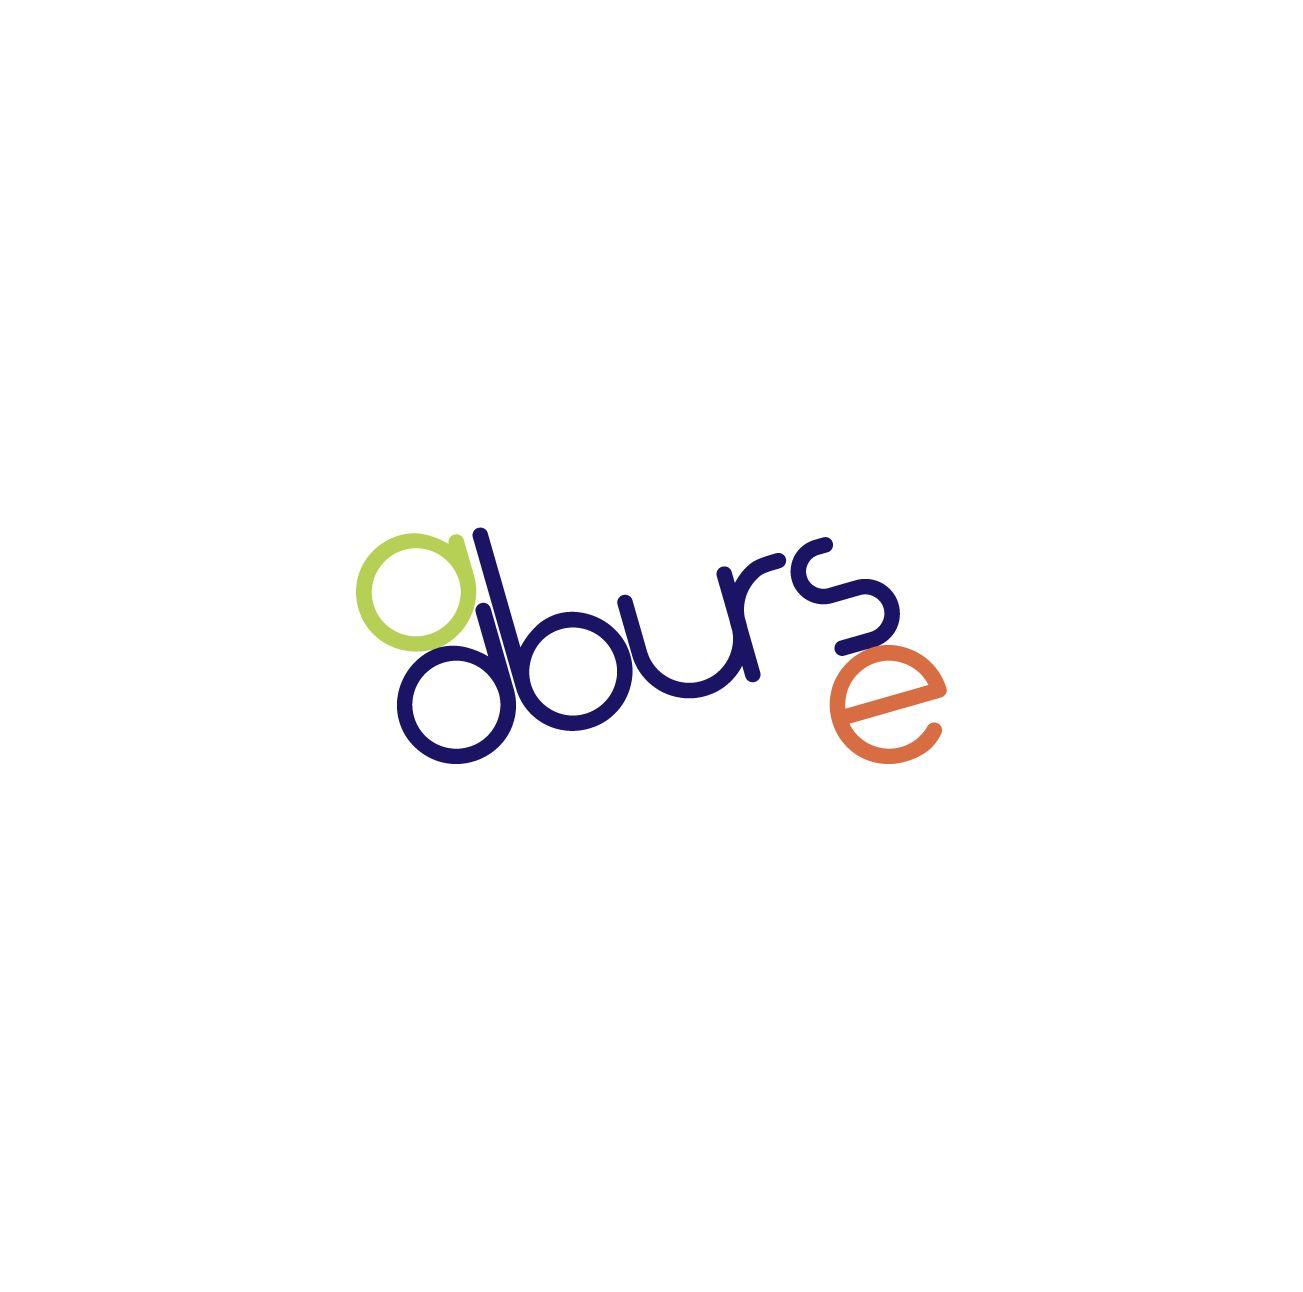 Логотип для Adburse - дизайнер dimma47